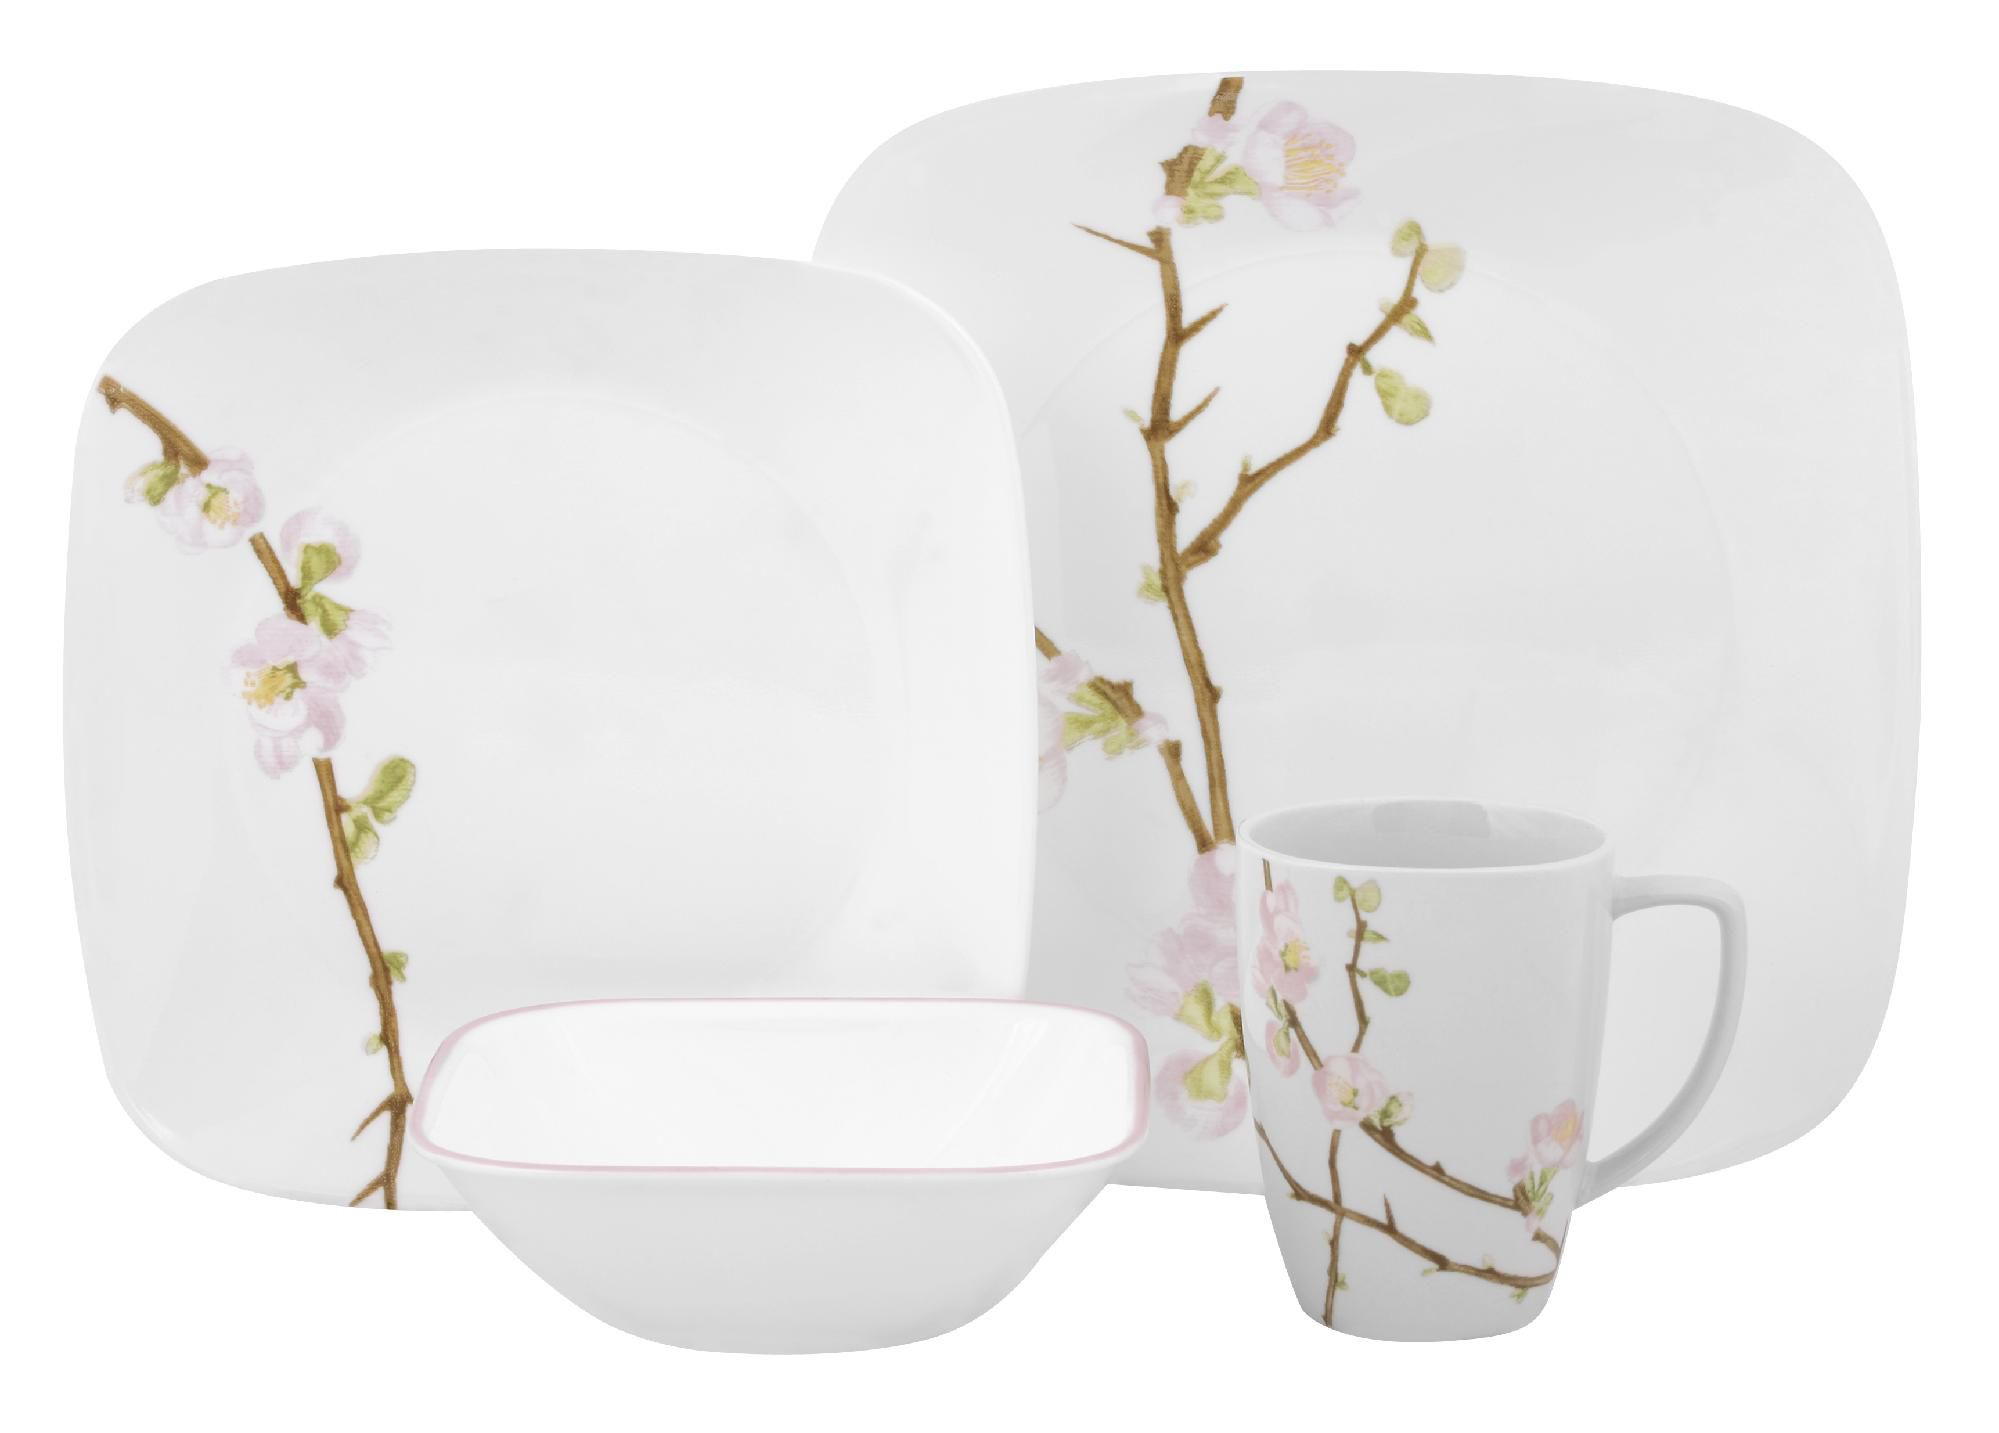 Corelle Square Cherry Blossom 16-Piece Dinnerware Set